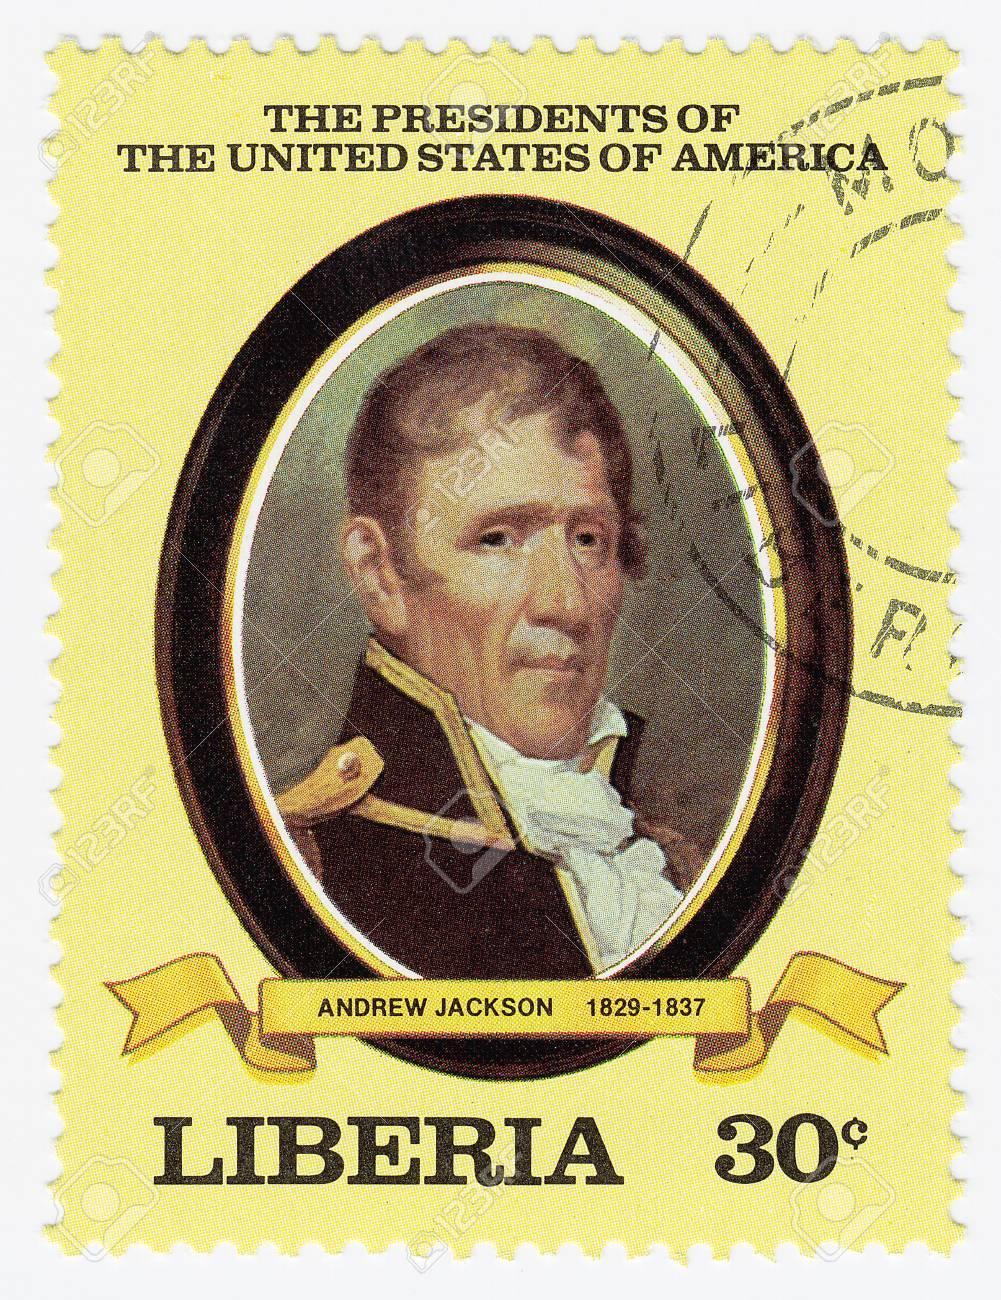 LIBERIA - CIRCA 2000   stamp printed in Liberia shows 7th president of USA Andrew Jackson, circa 2000 Stock Photo - 15768003